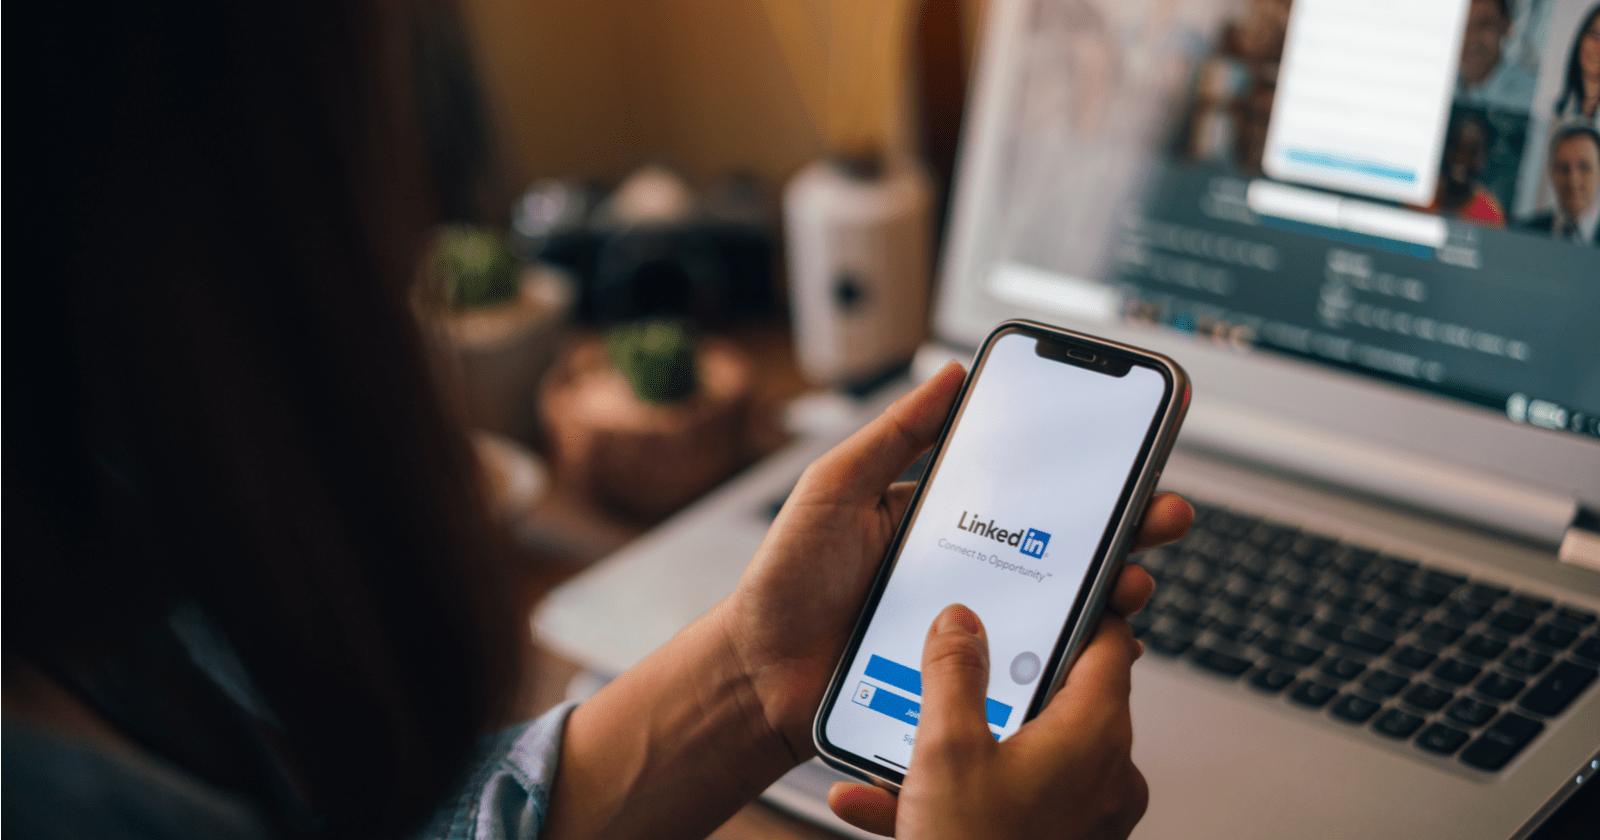 LinkedIn: No Longer Just a B2B Platform